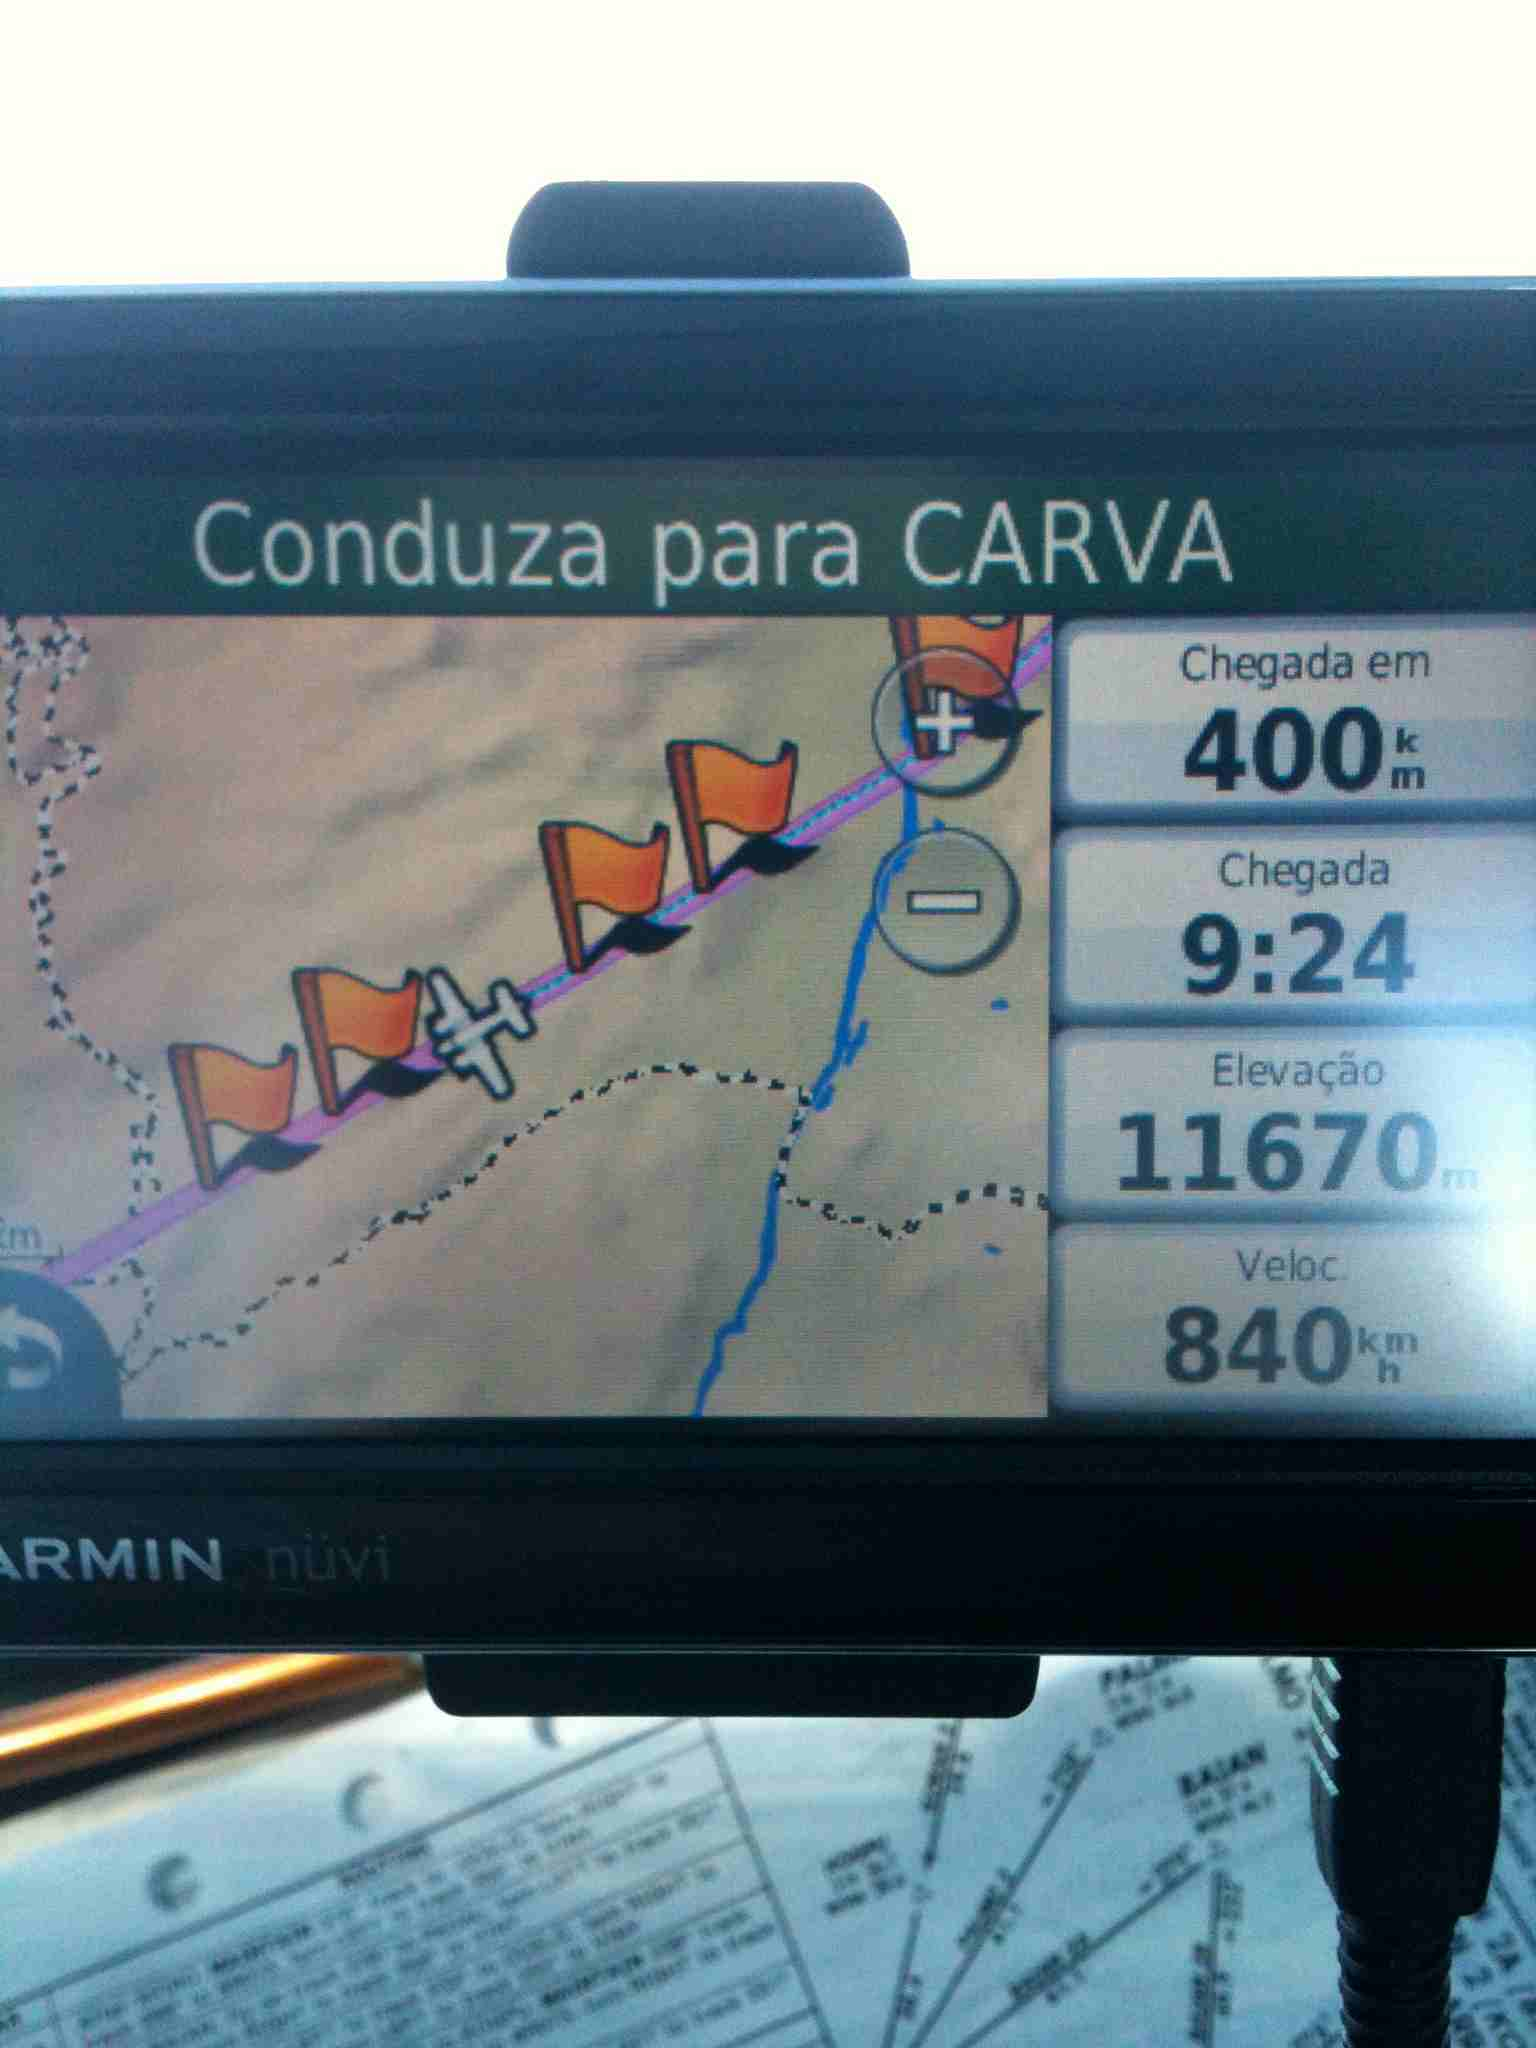 GPS GARMIN NUVI CONFIGURACION BANCO DE DATOS AERONAUTICO